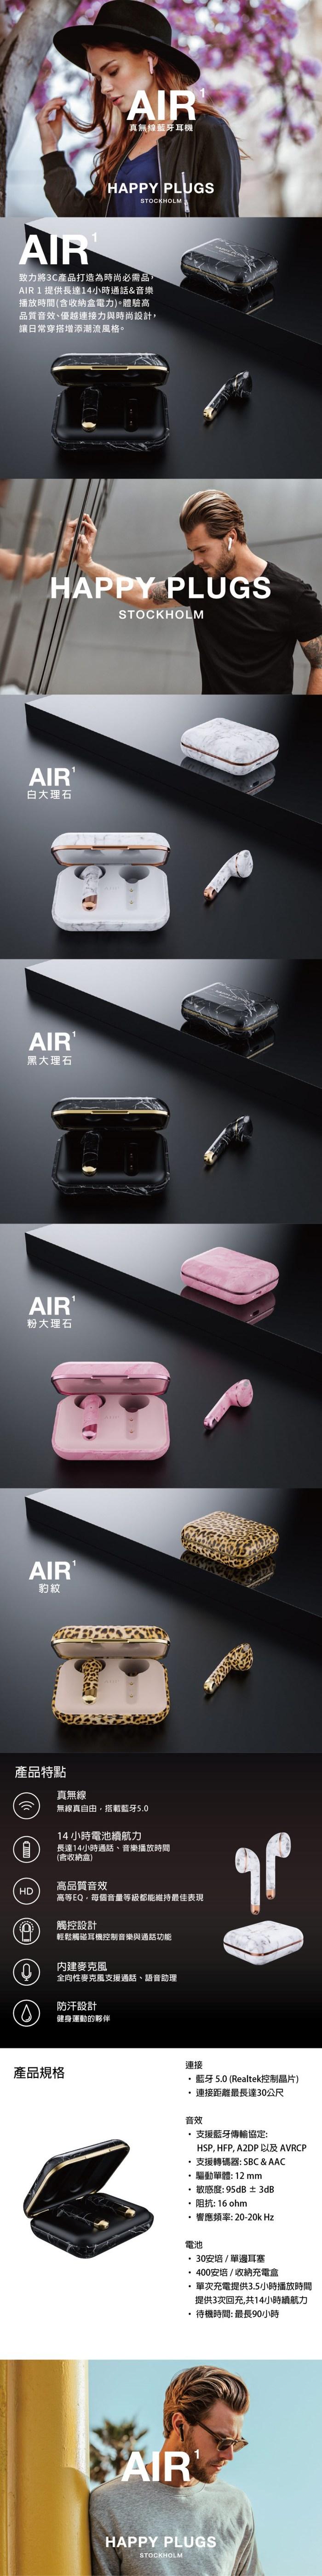 HAPPY PLUGS|Air 1真無線藍牙耳機(黑大理石)